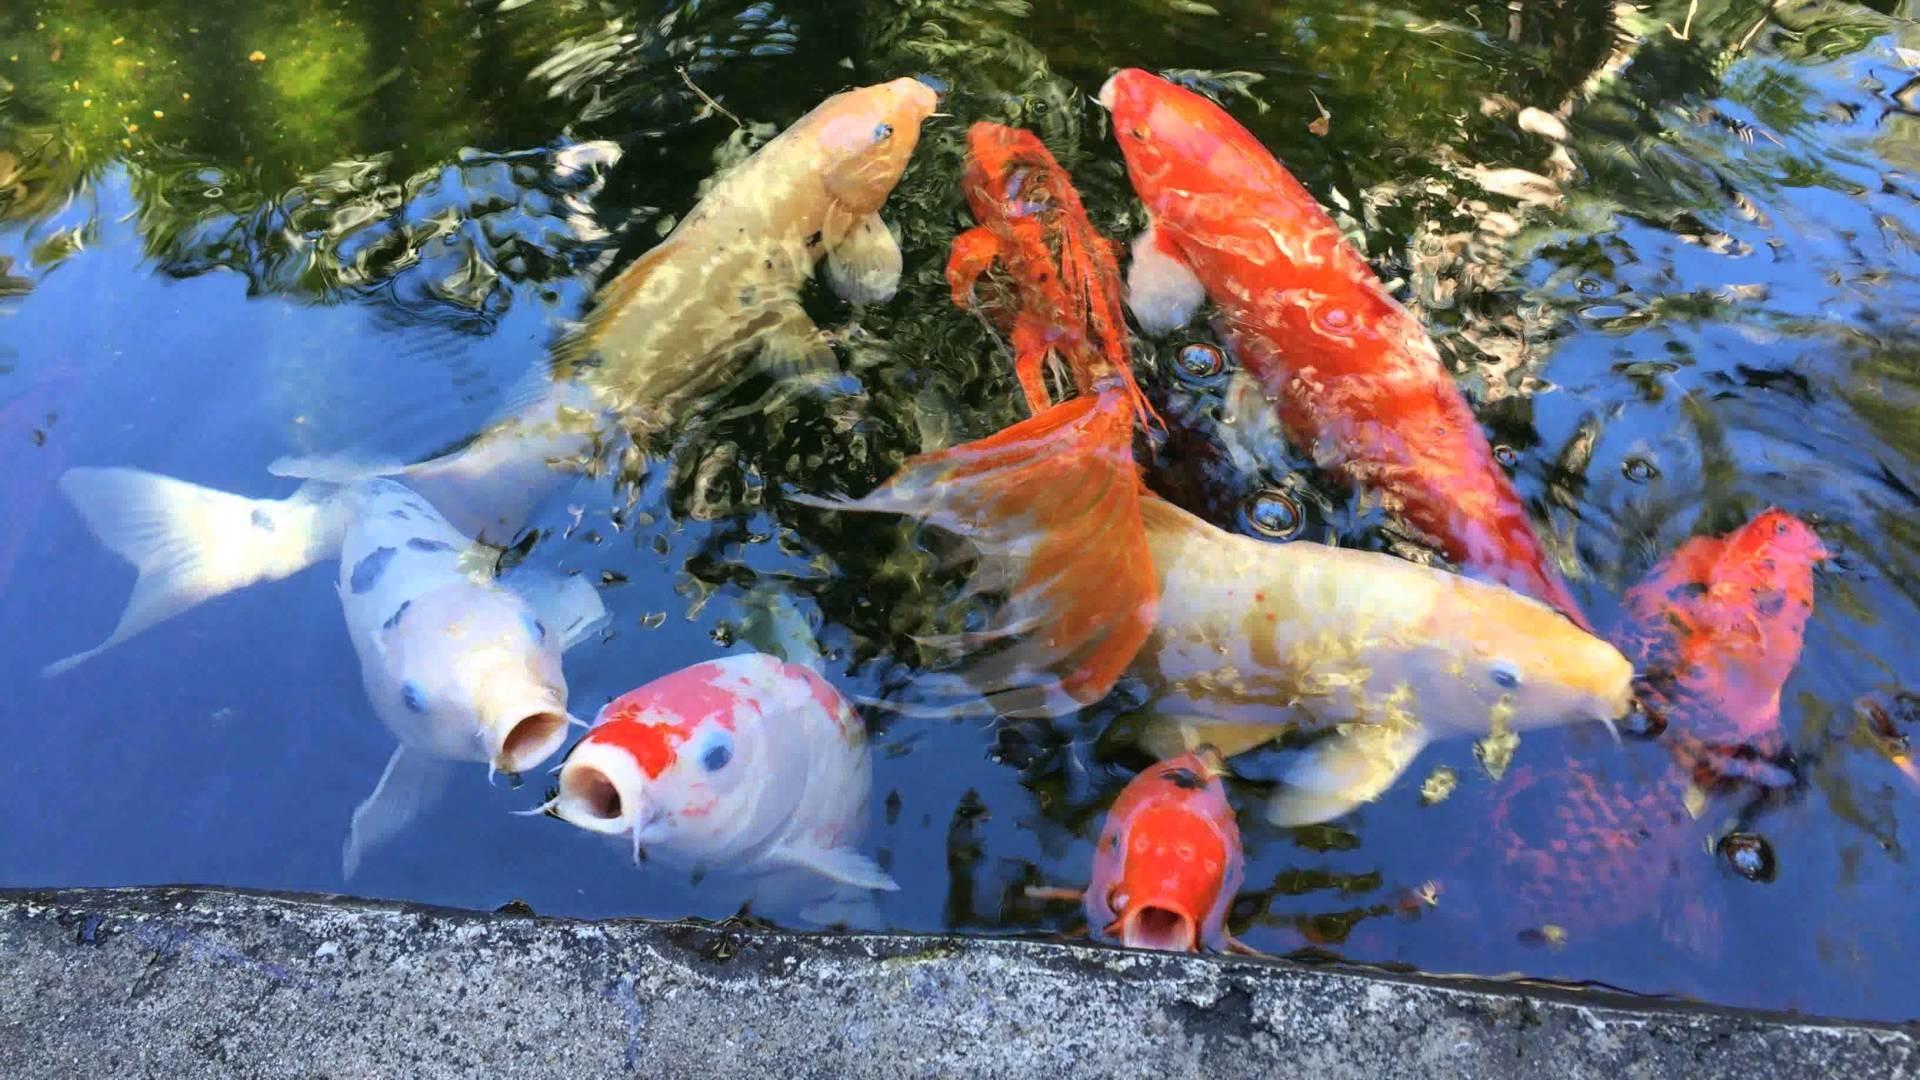 Koi fish pond at Marie Selby Botanical Gardens in Sarasota Florida in 4K